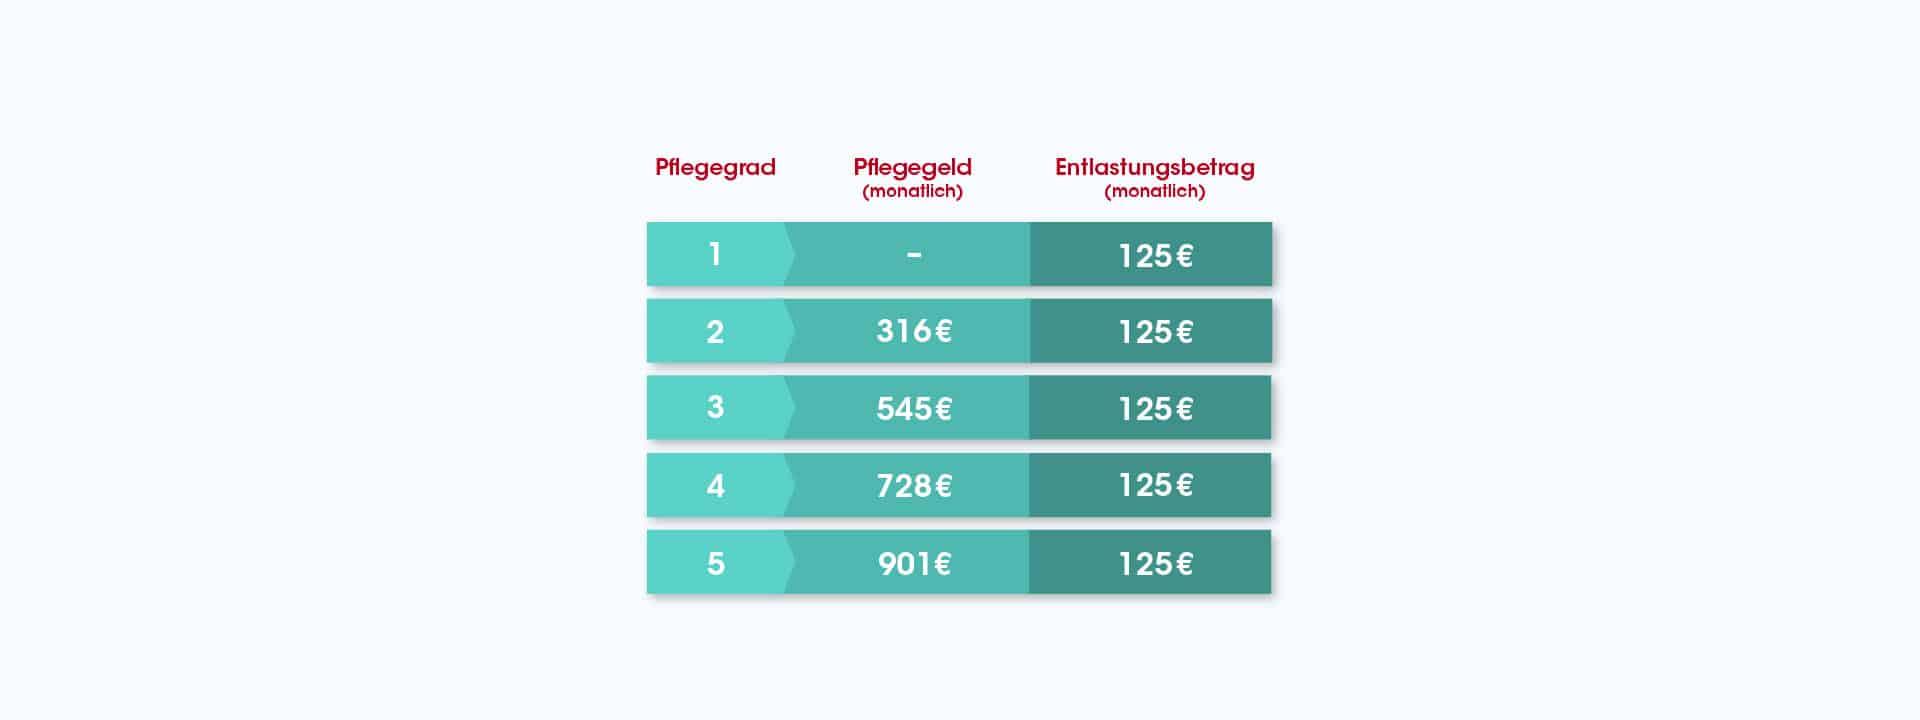 Tabelle zum Pflegebetrag nach Pflegegrad bei Epidermolysis Bullosa